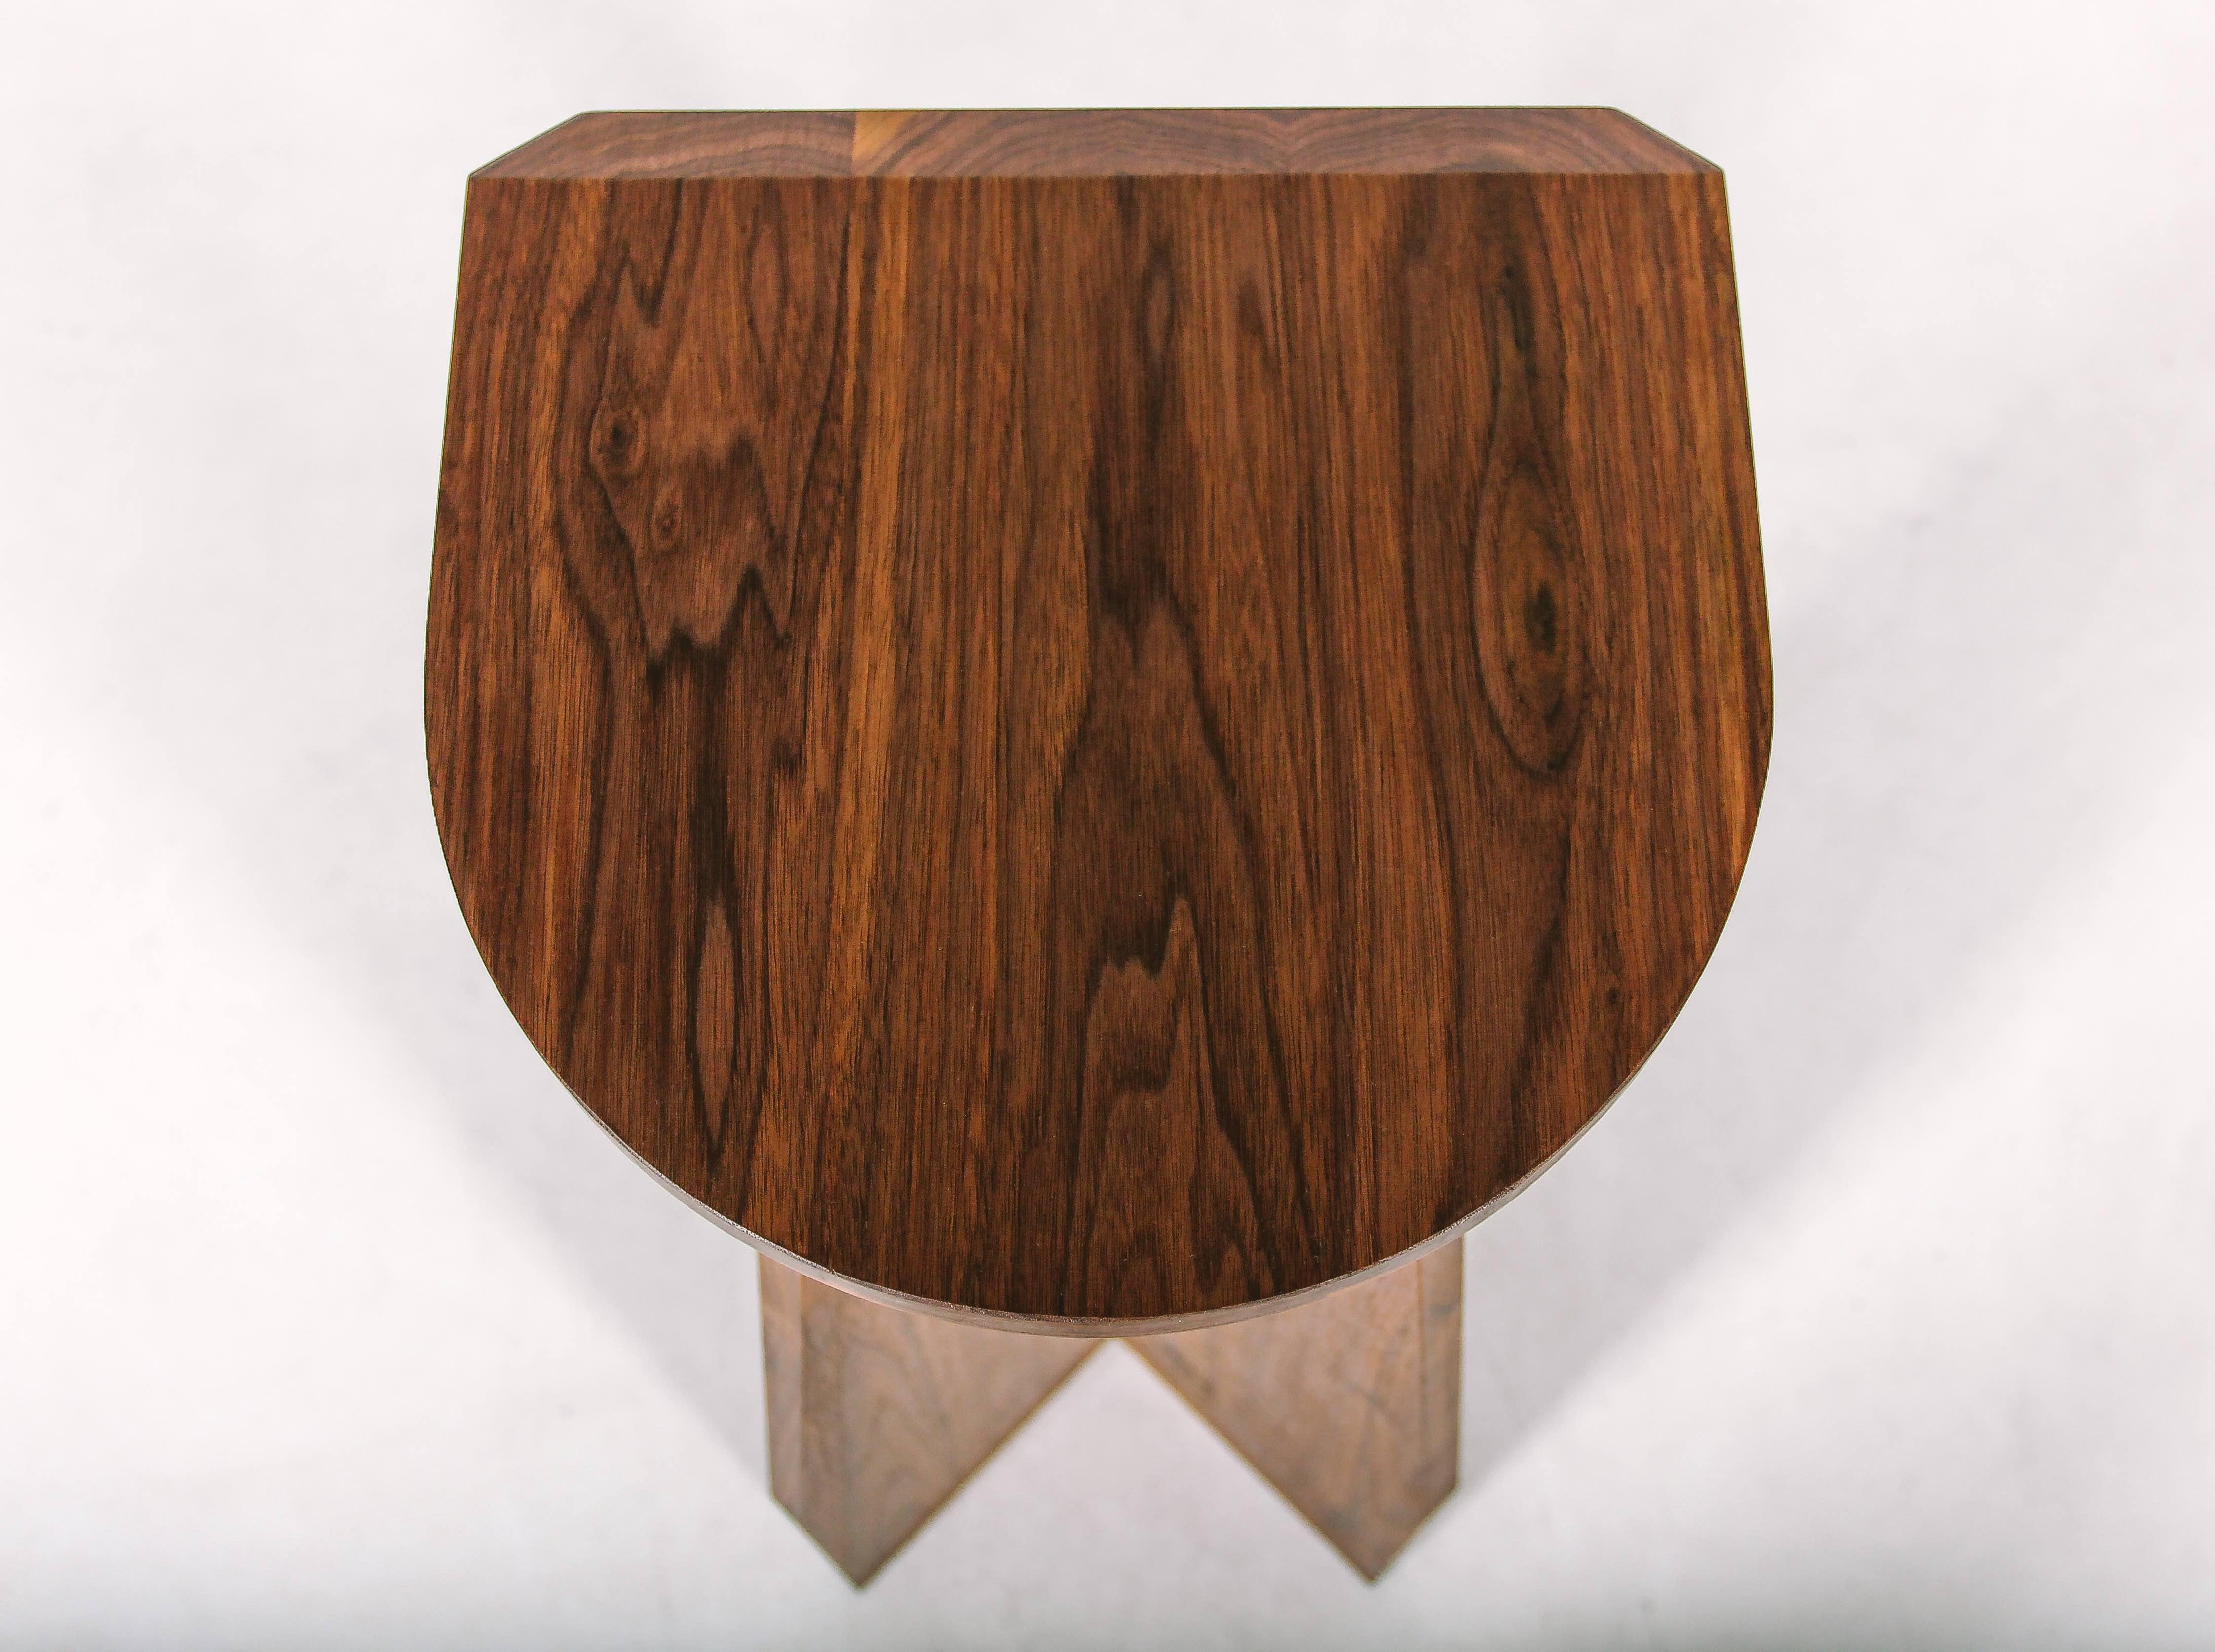 Барный стул Massive Fly из американского ореха и дуба от Fly Massive Millworks